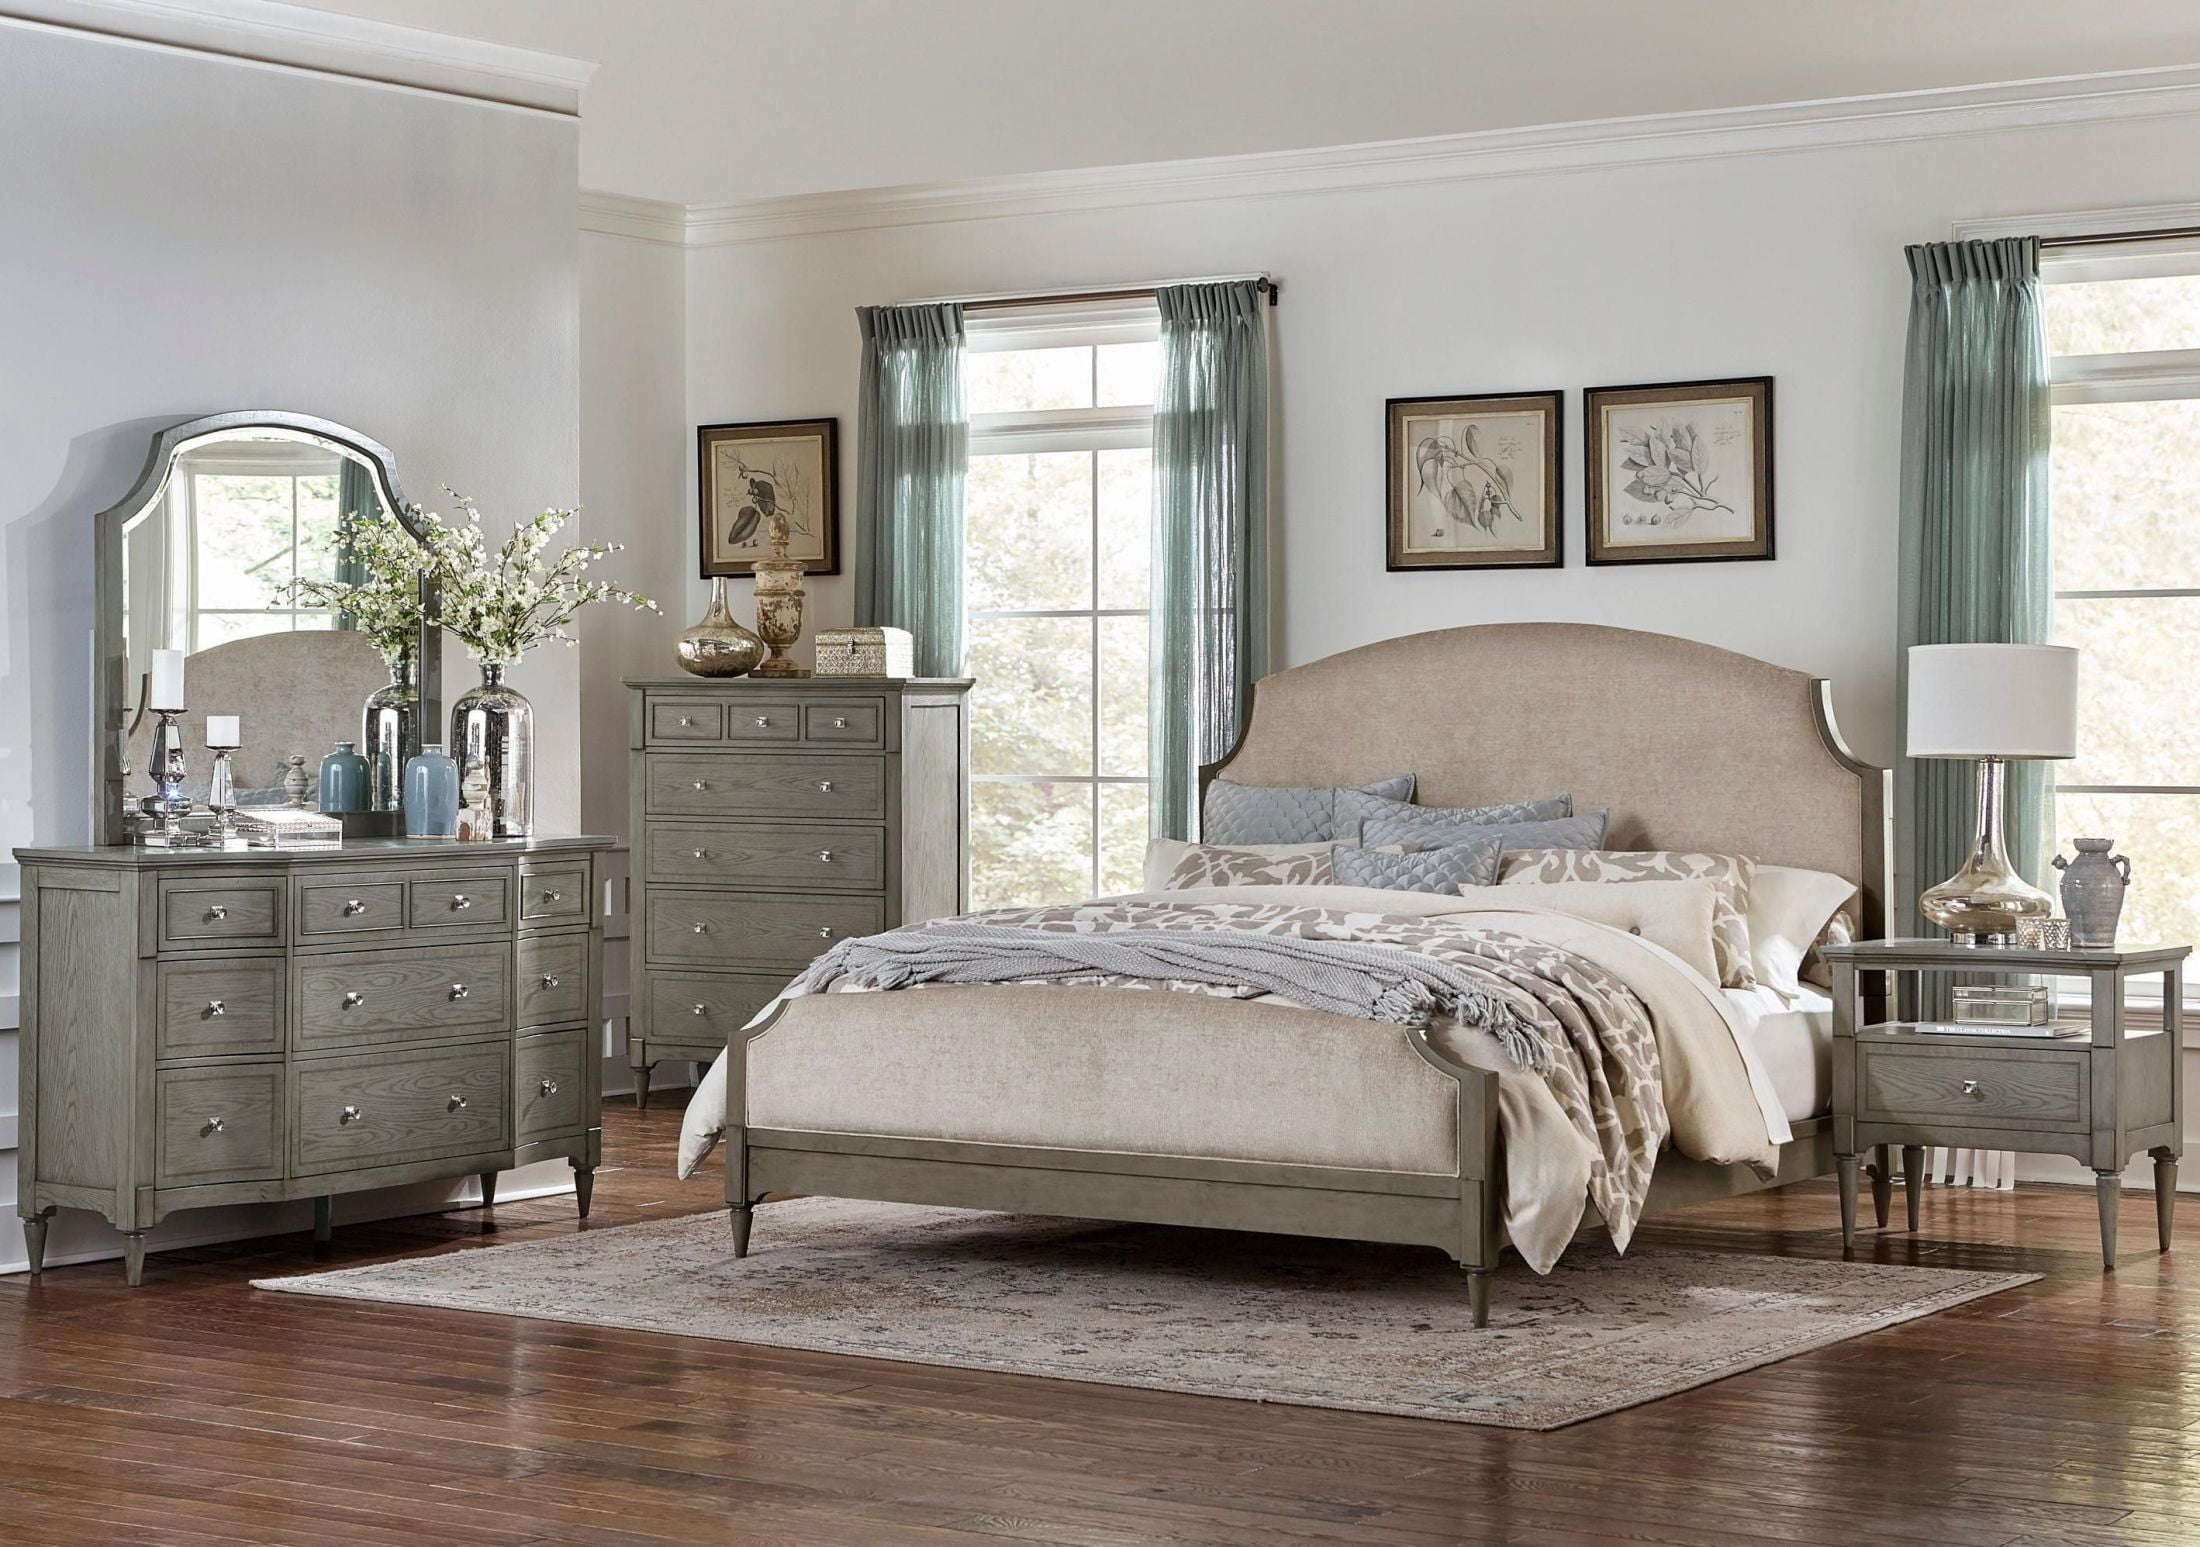 Albright Driftwood Gray Upholstered Bedroom Set From